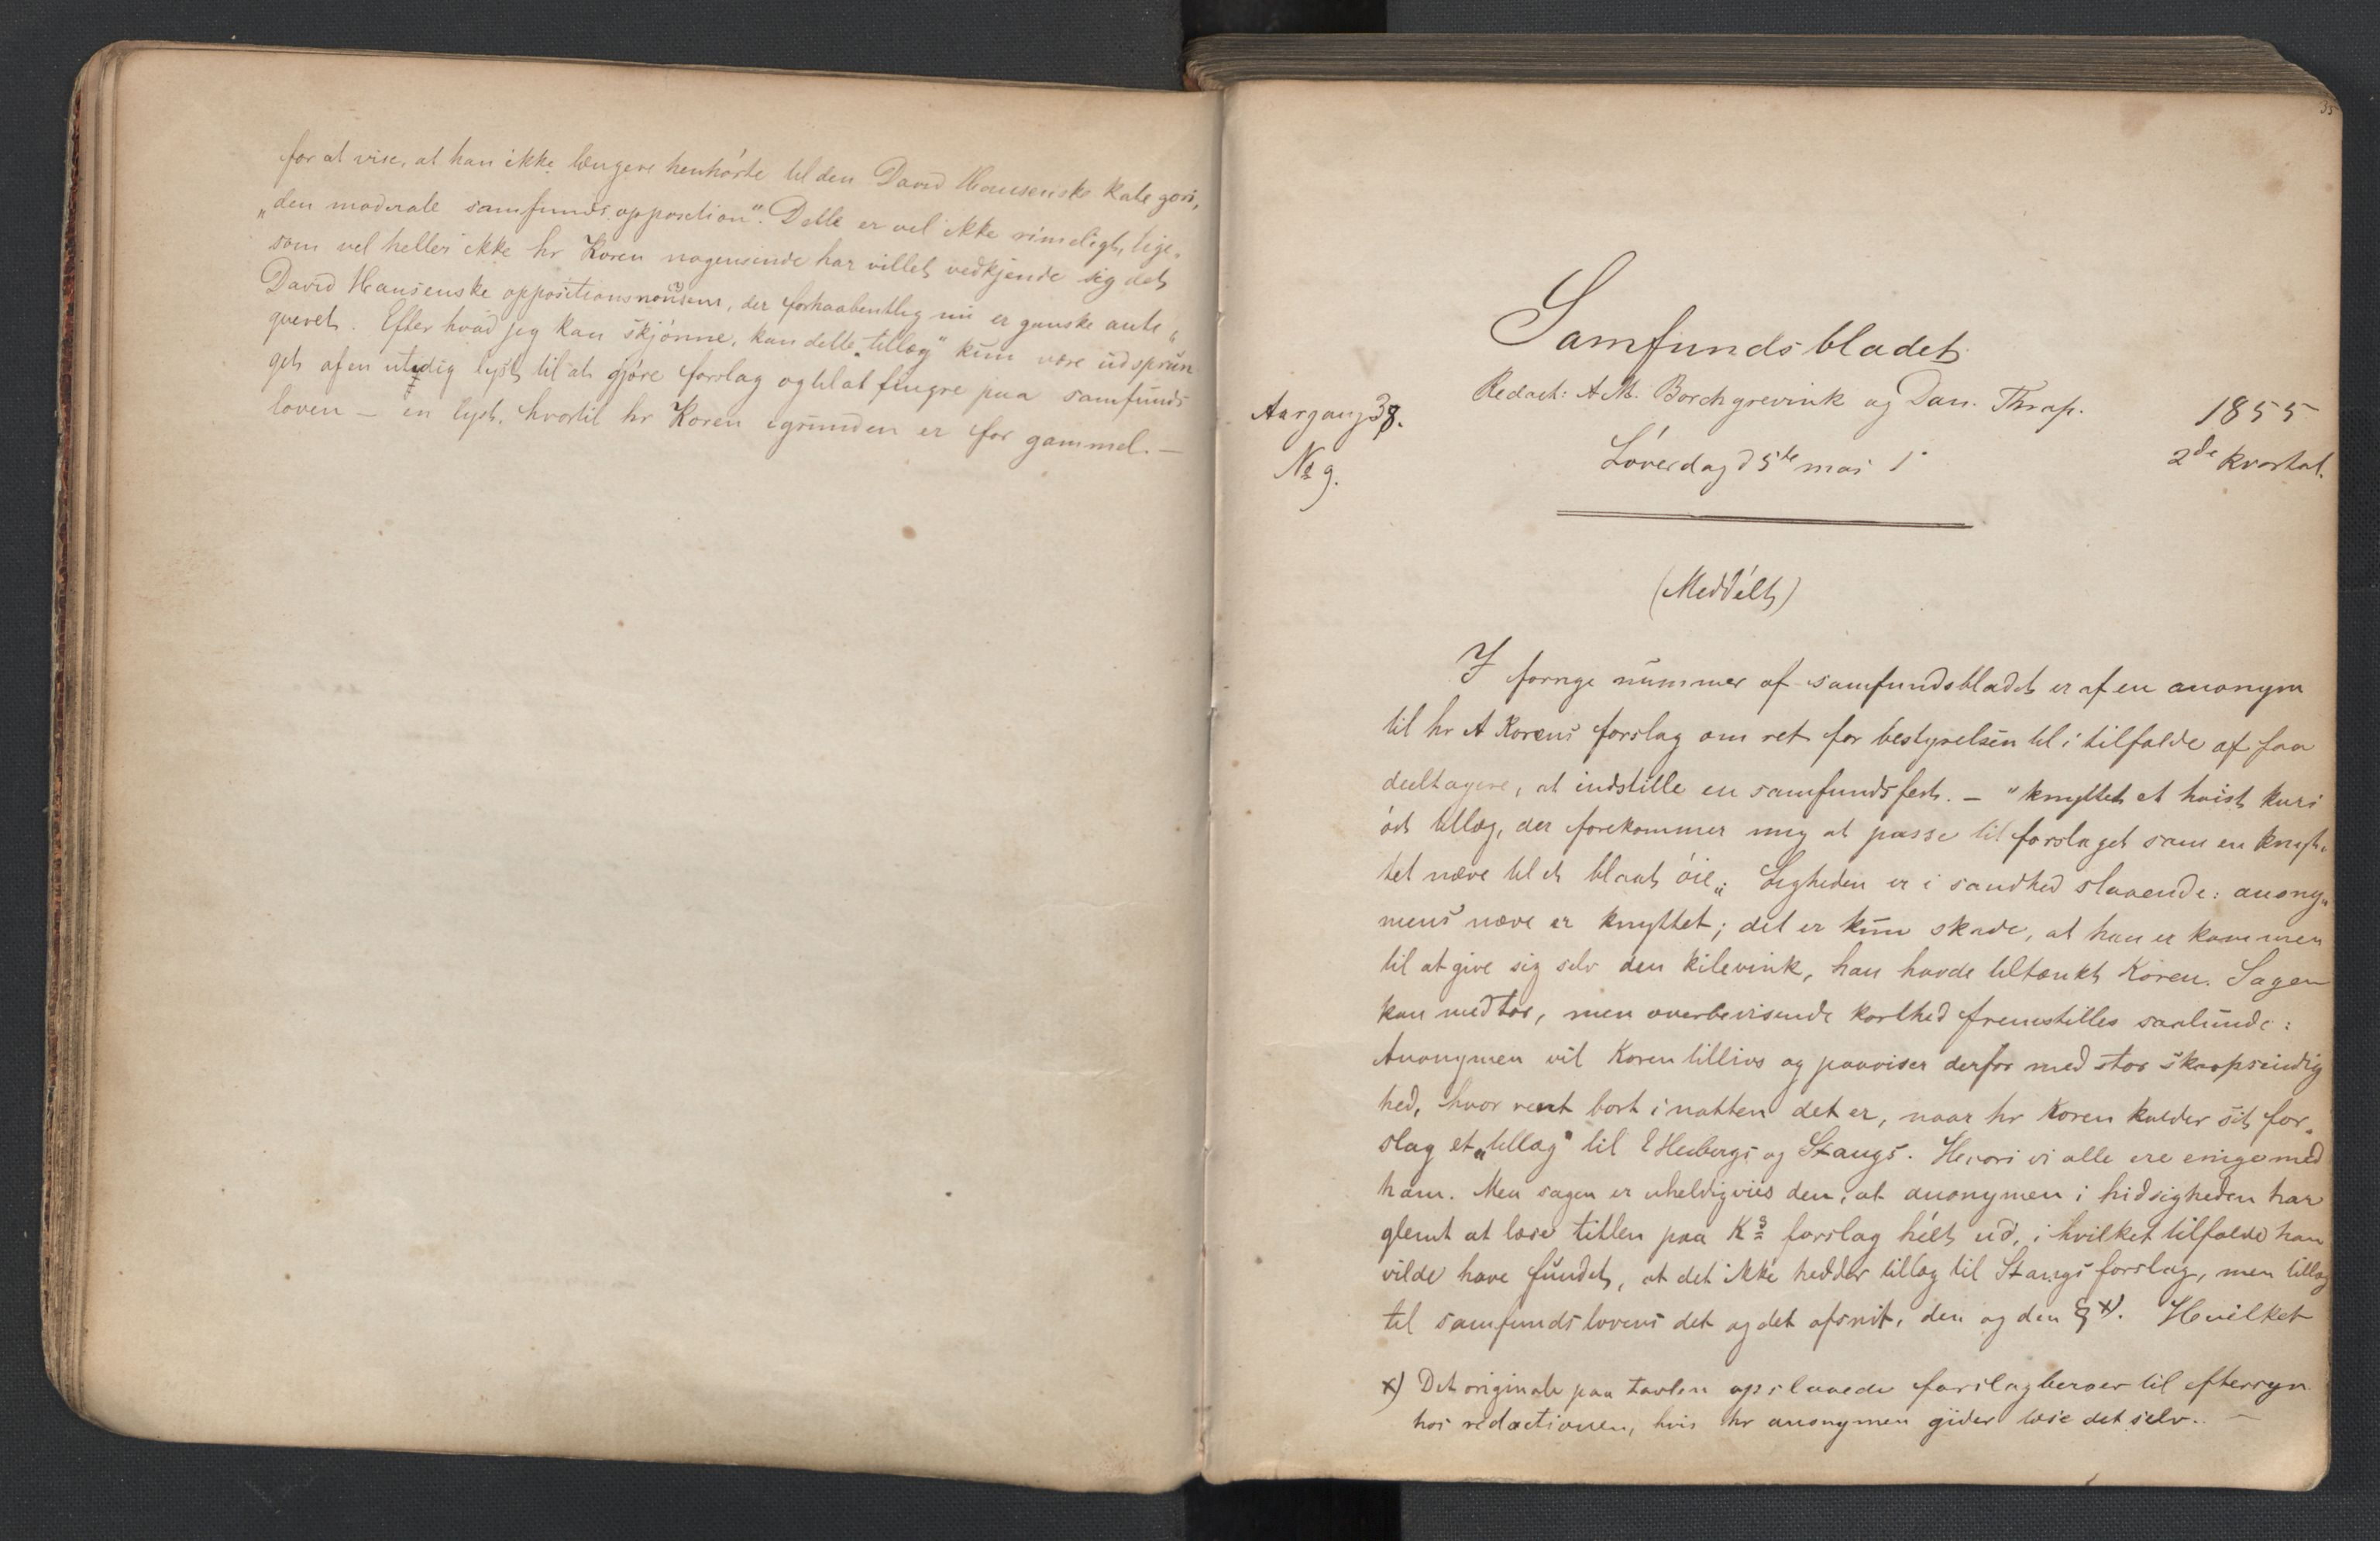 RA, Det Norske Studentersamfund, X/Xa/L0005, 1855-1856, s. 19